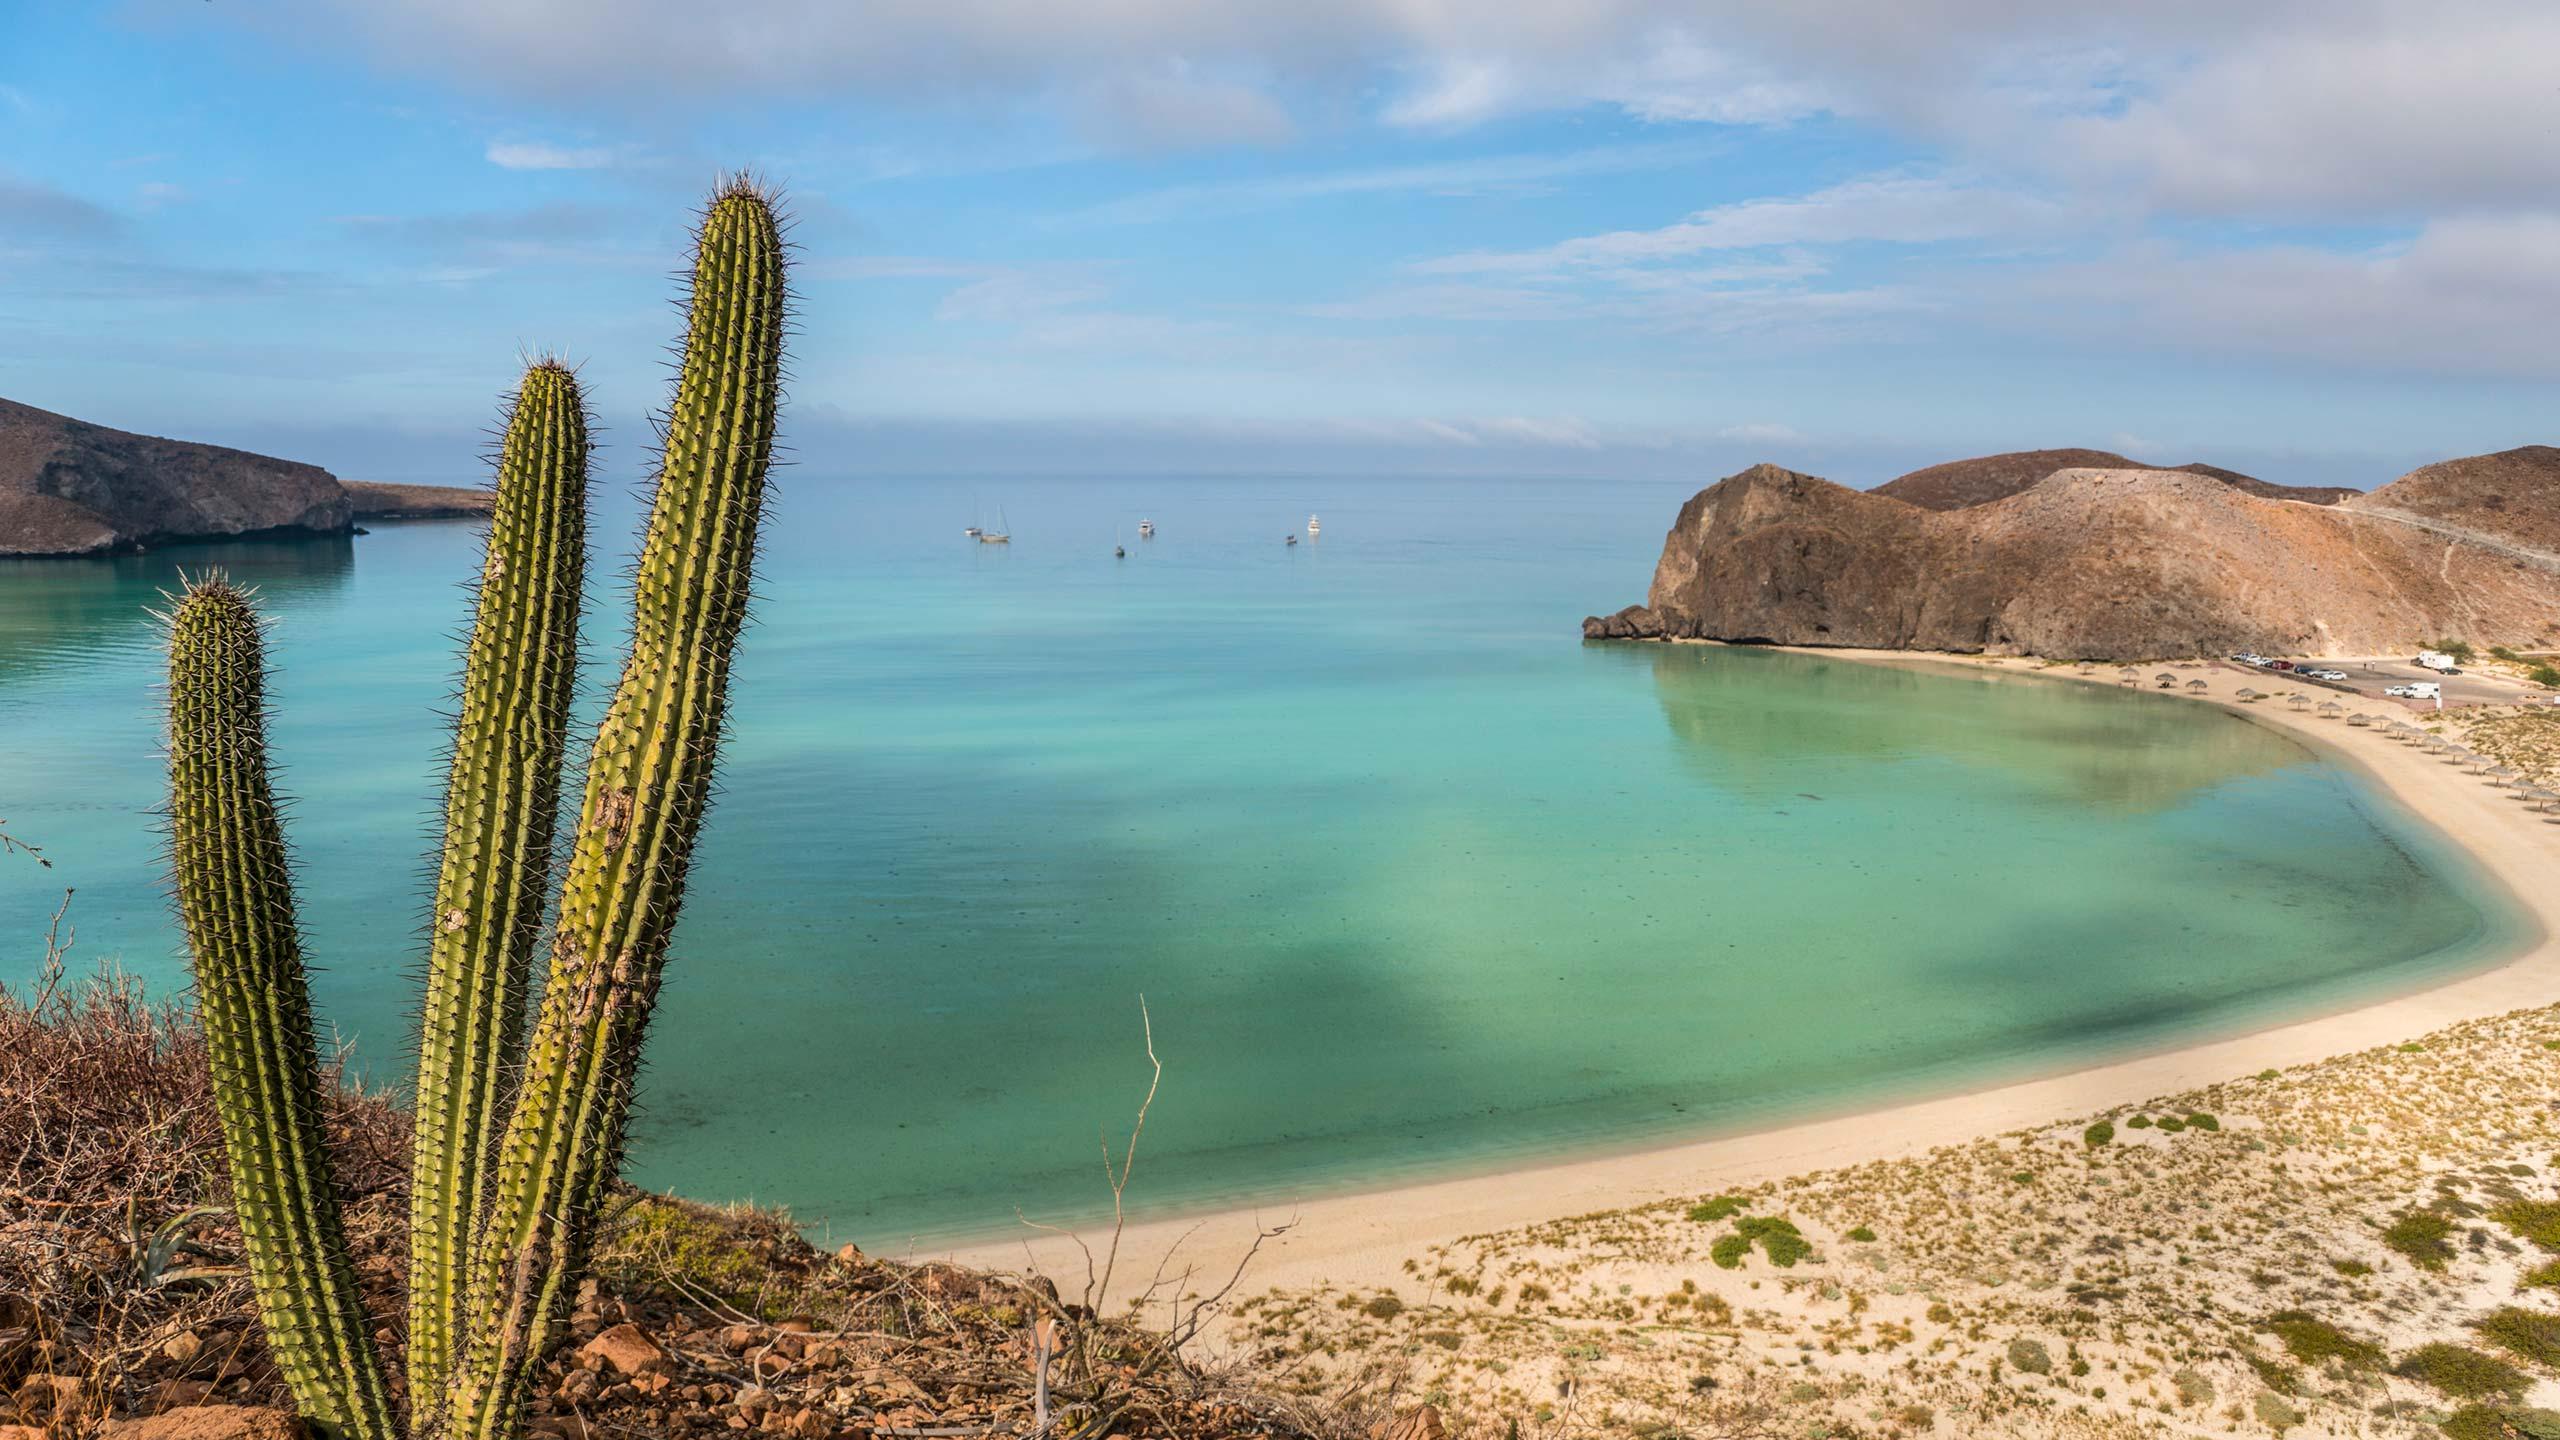 Balandra Beach on the Gulf of California near La Paz Mexico on Baja California Sur